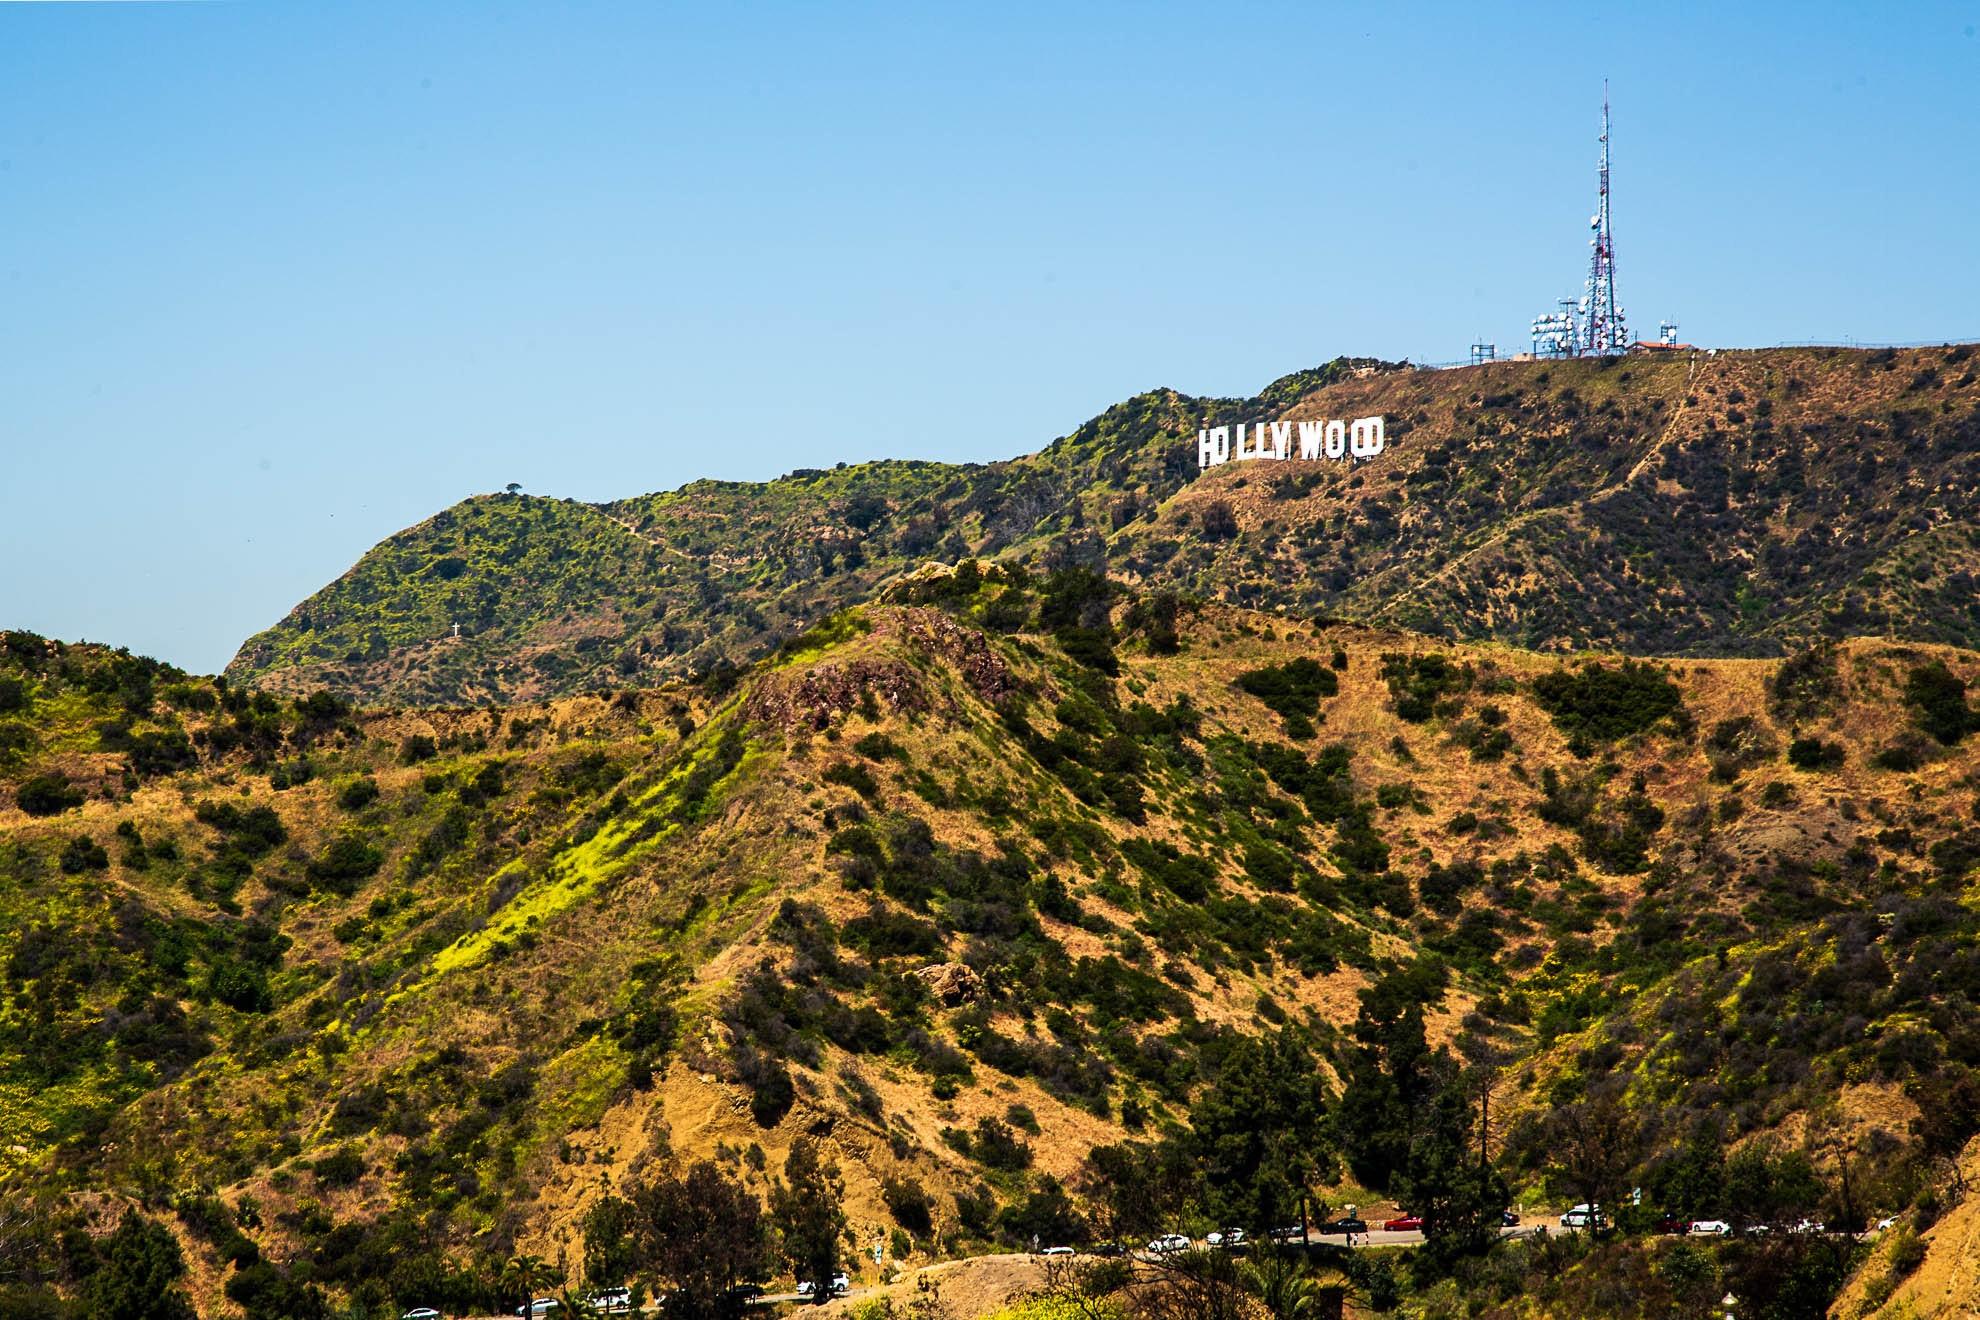 Hollywood Sign, Firebreak Trail